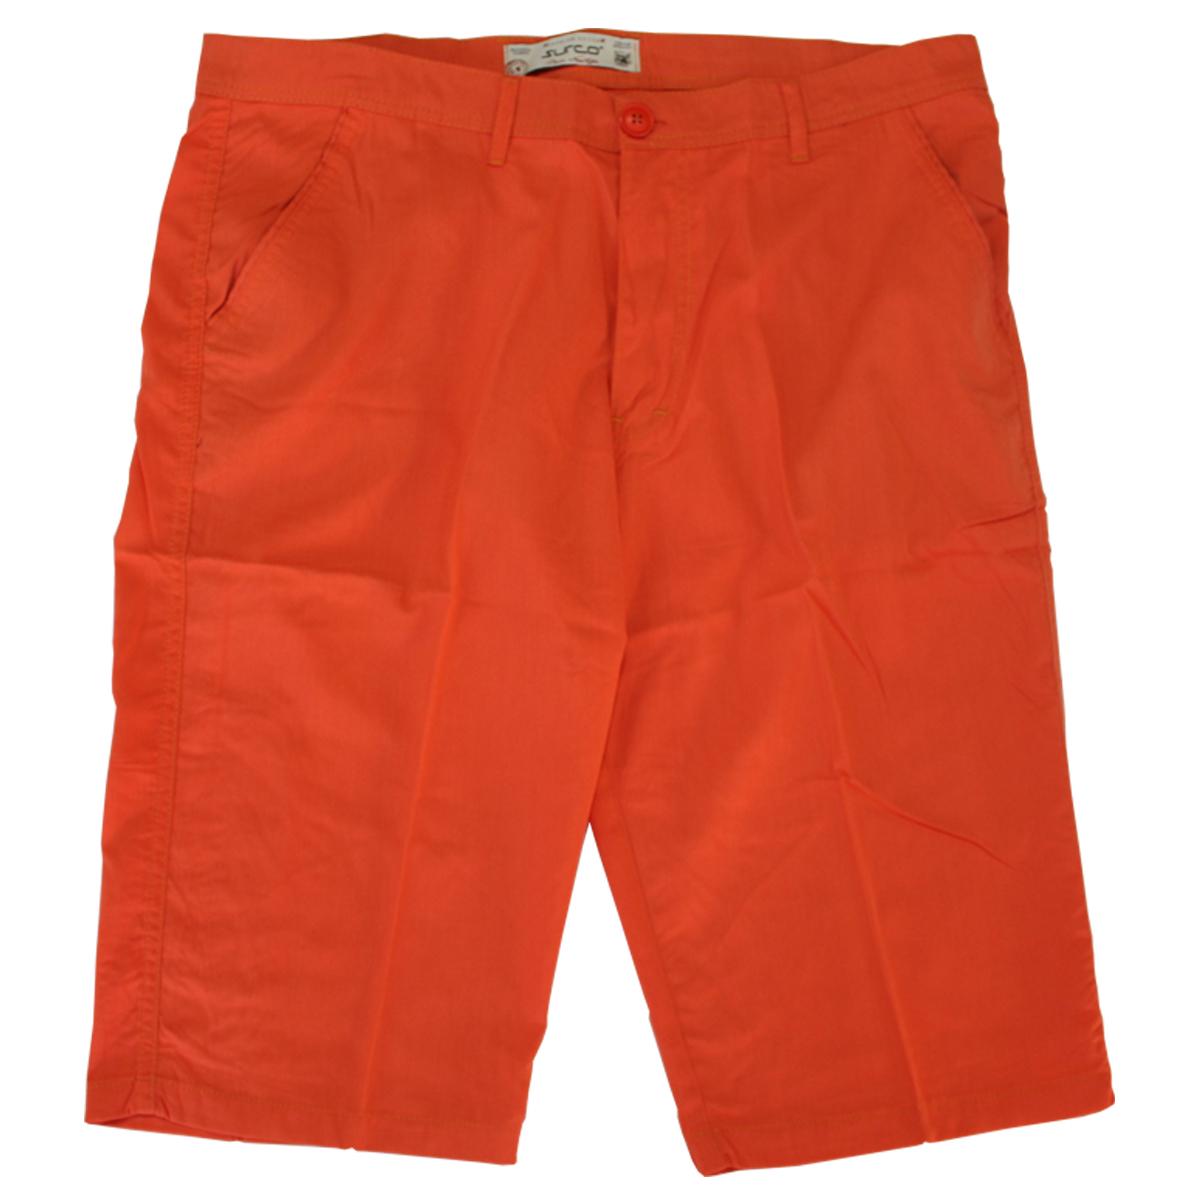 Pantalon trei sferturi portocaliu, Marime 64 - egato.ro